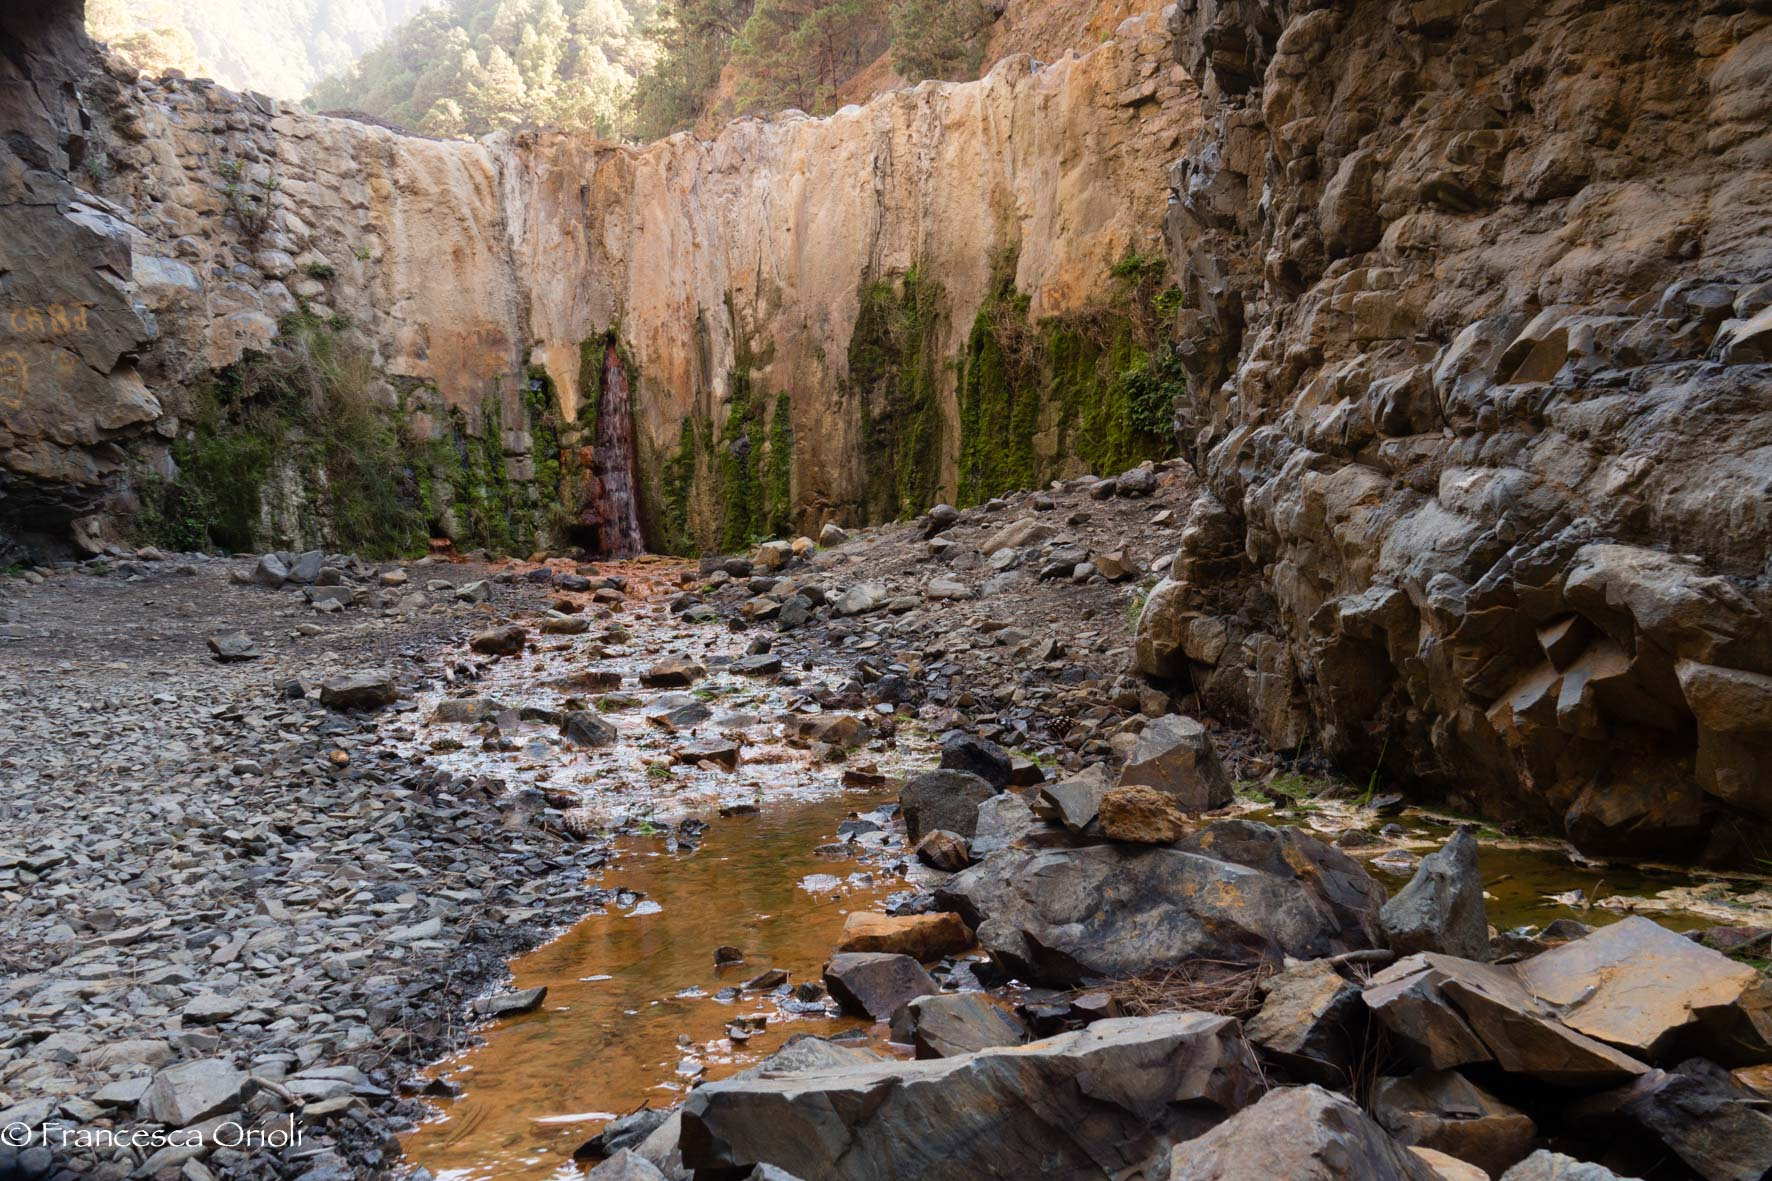 Caldera de Taburiente - Cascada de Colores..in secca